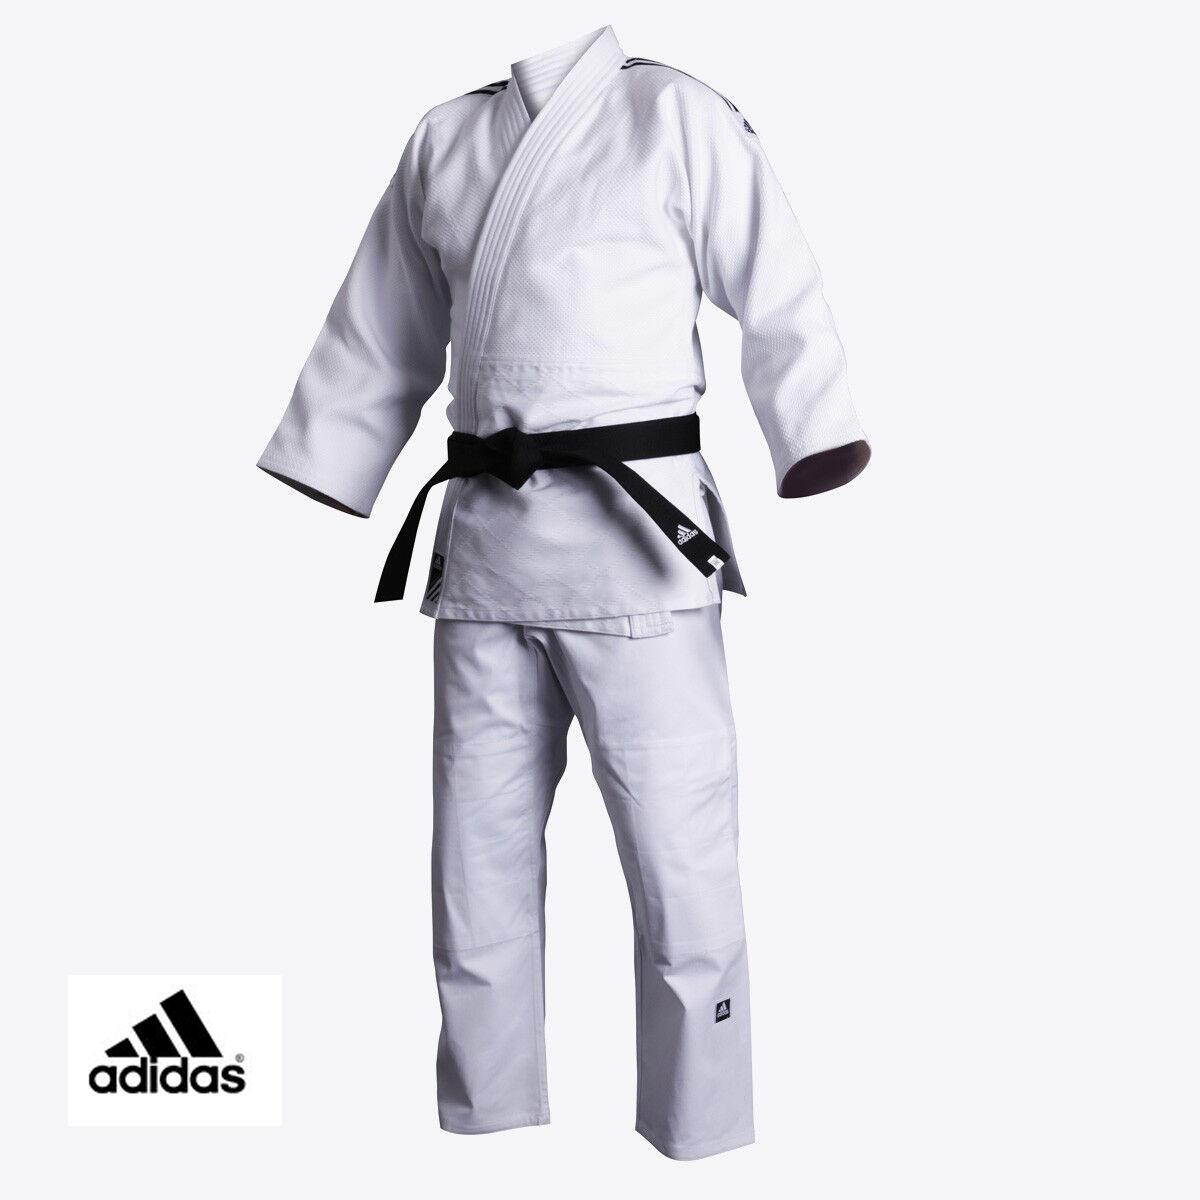 NEW adidas WHITE Judo CONTEST Gi DELUXE  Single Weave Judo Uniform-J650  big discount